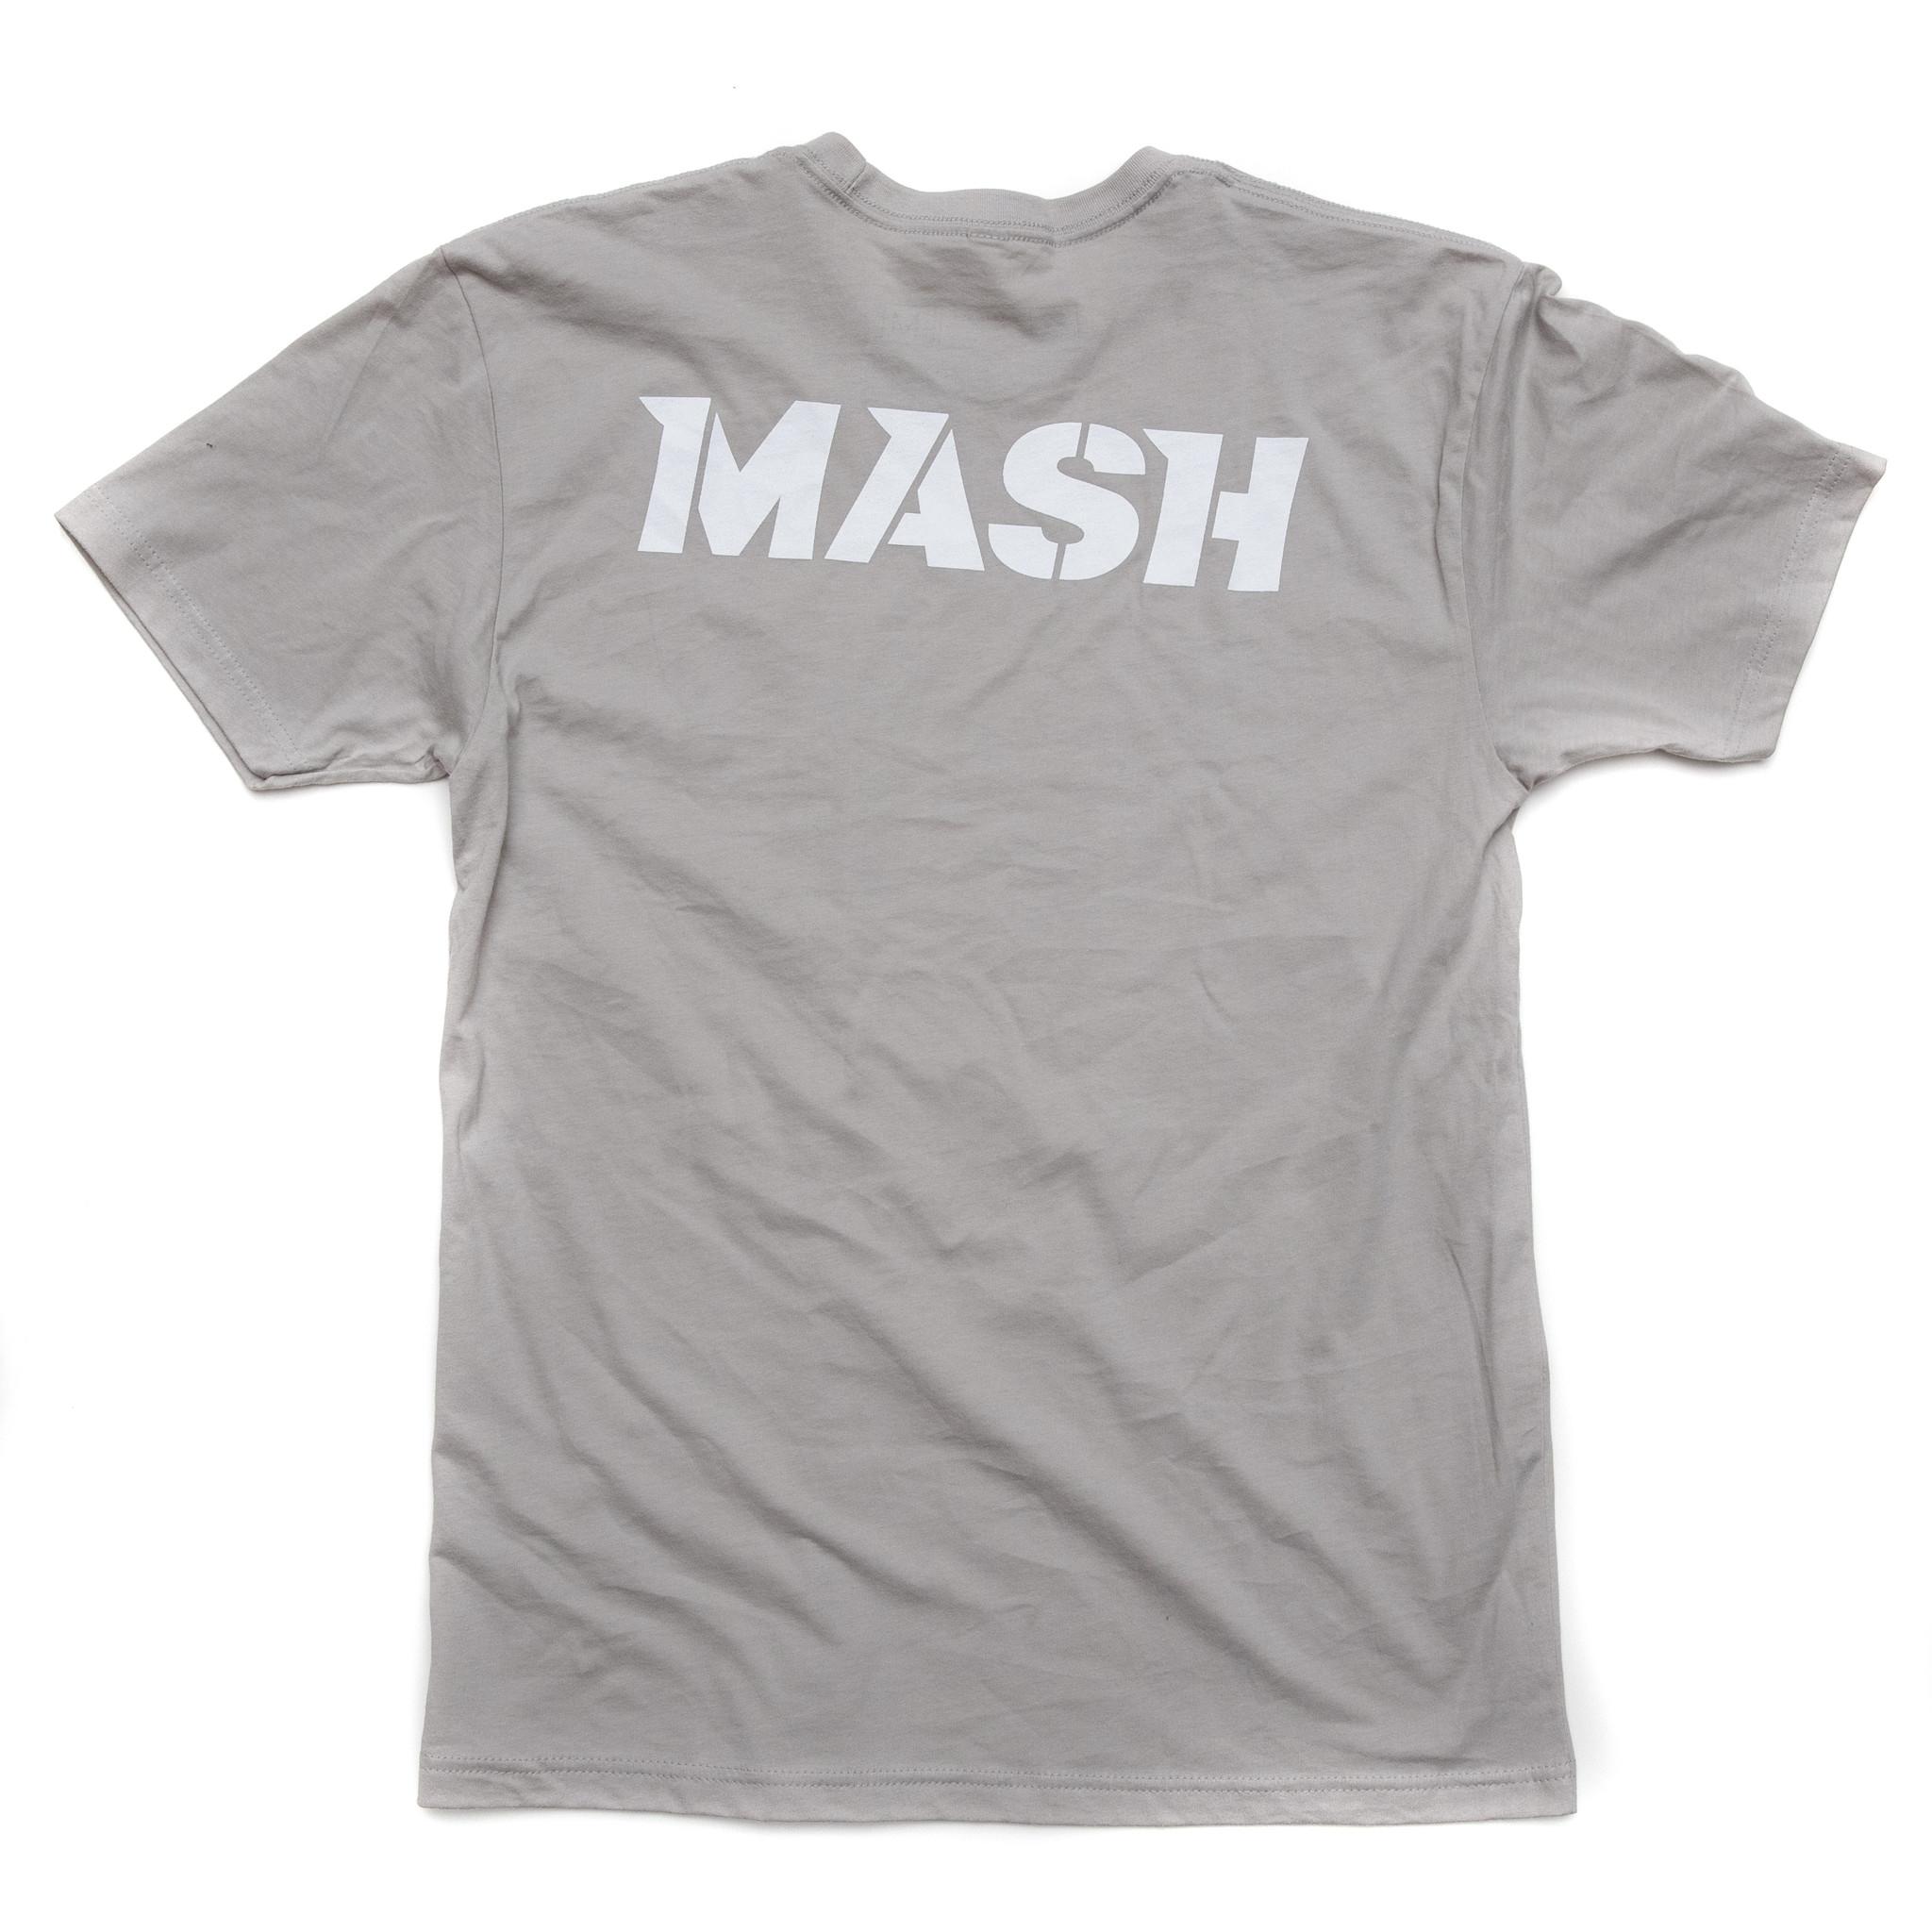 MASH Wordmark Shirt